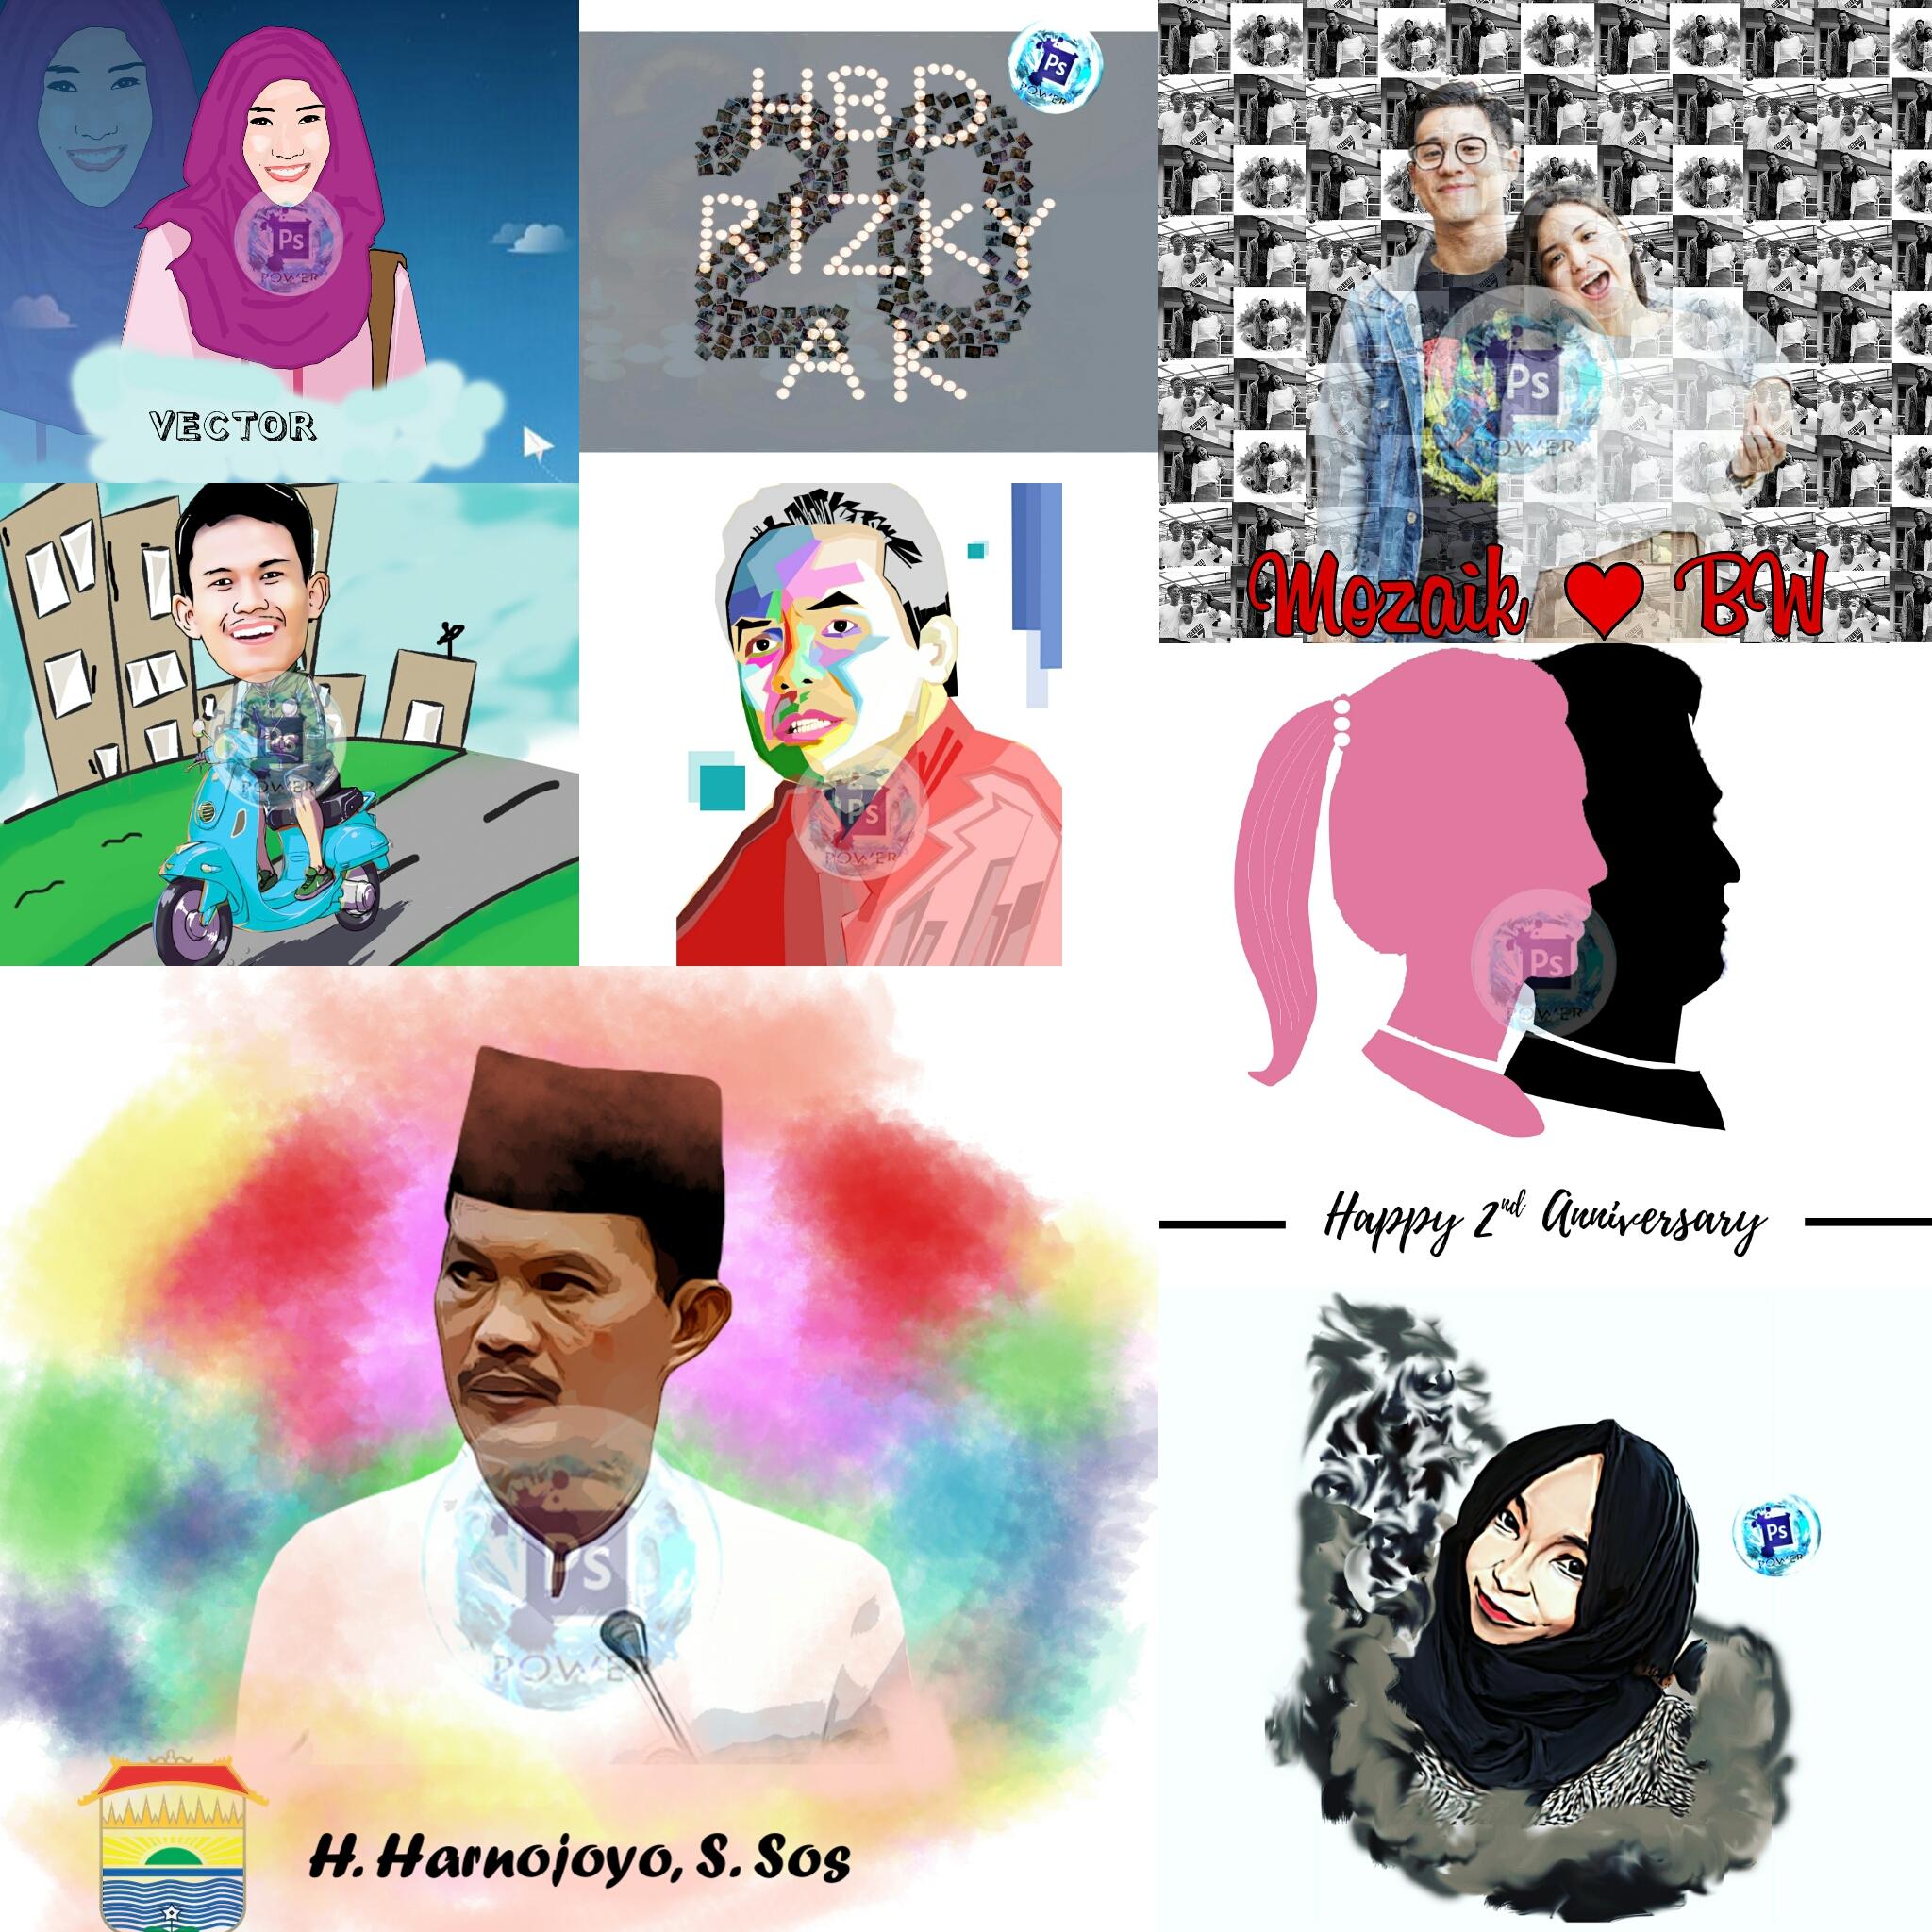 Jual Kado Artwork Karikatur Mozaik Siluet Vector WPAP Palembang